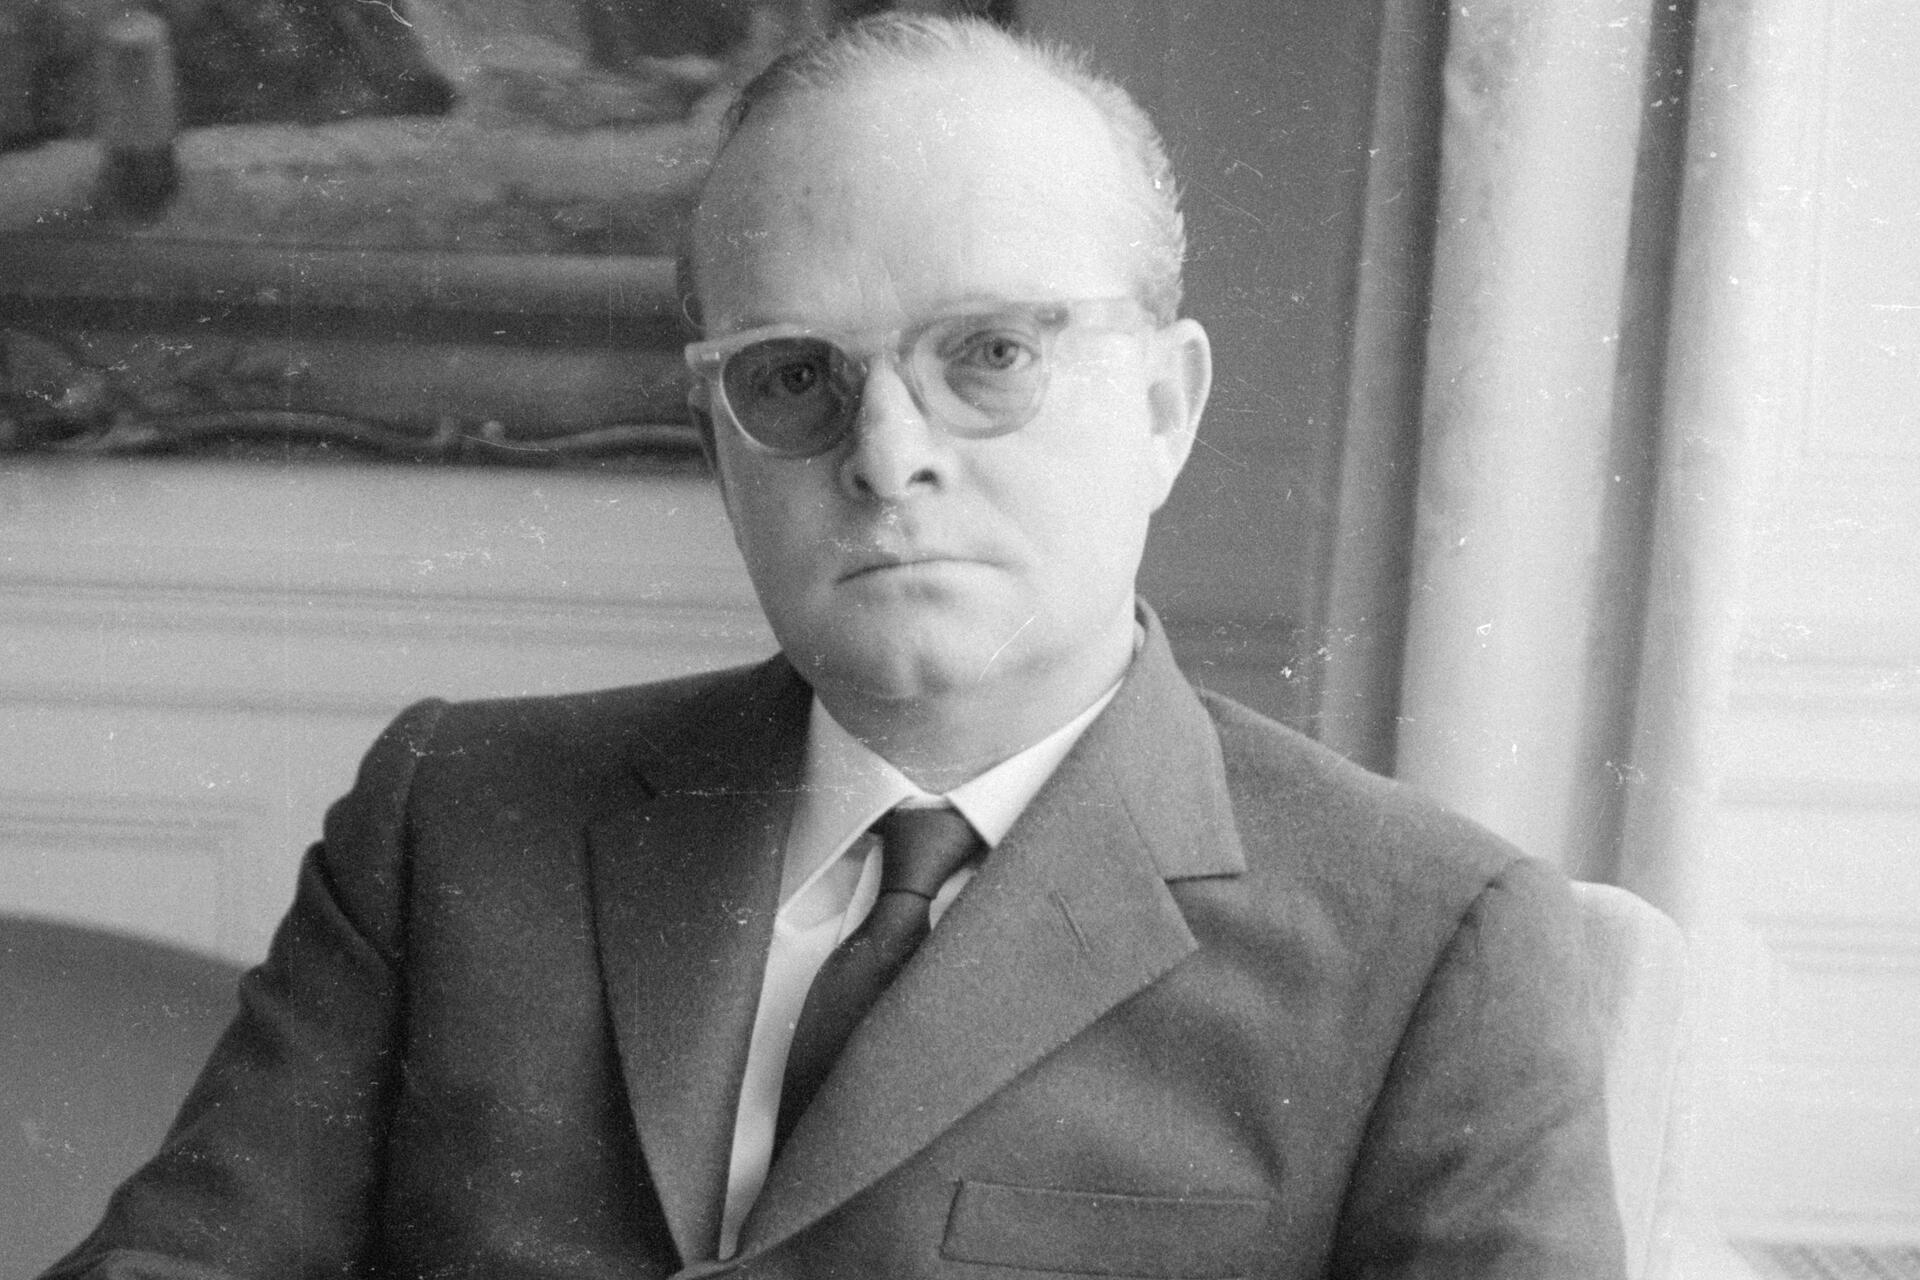 Bild zu Truman Capote